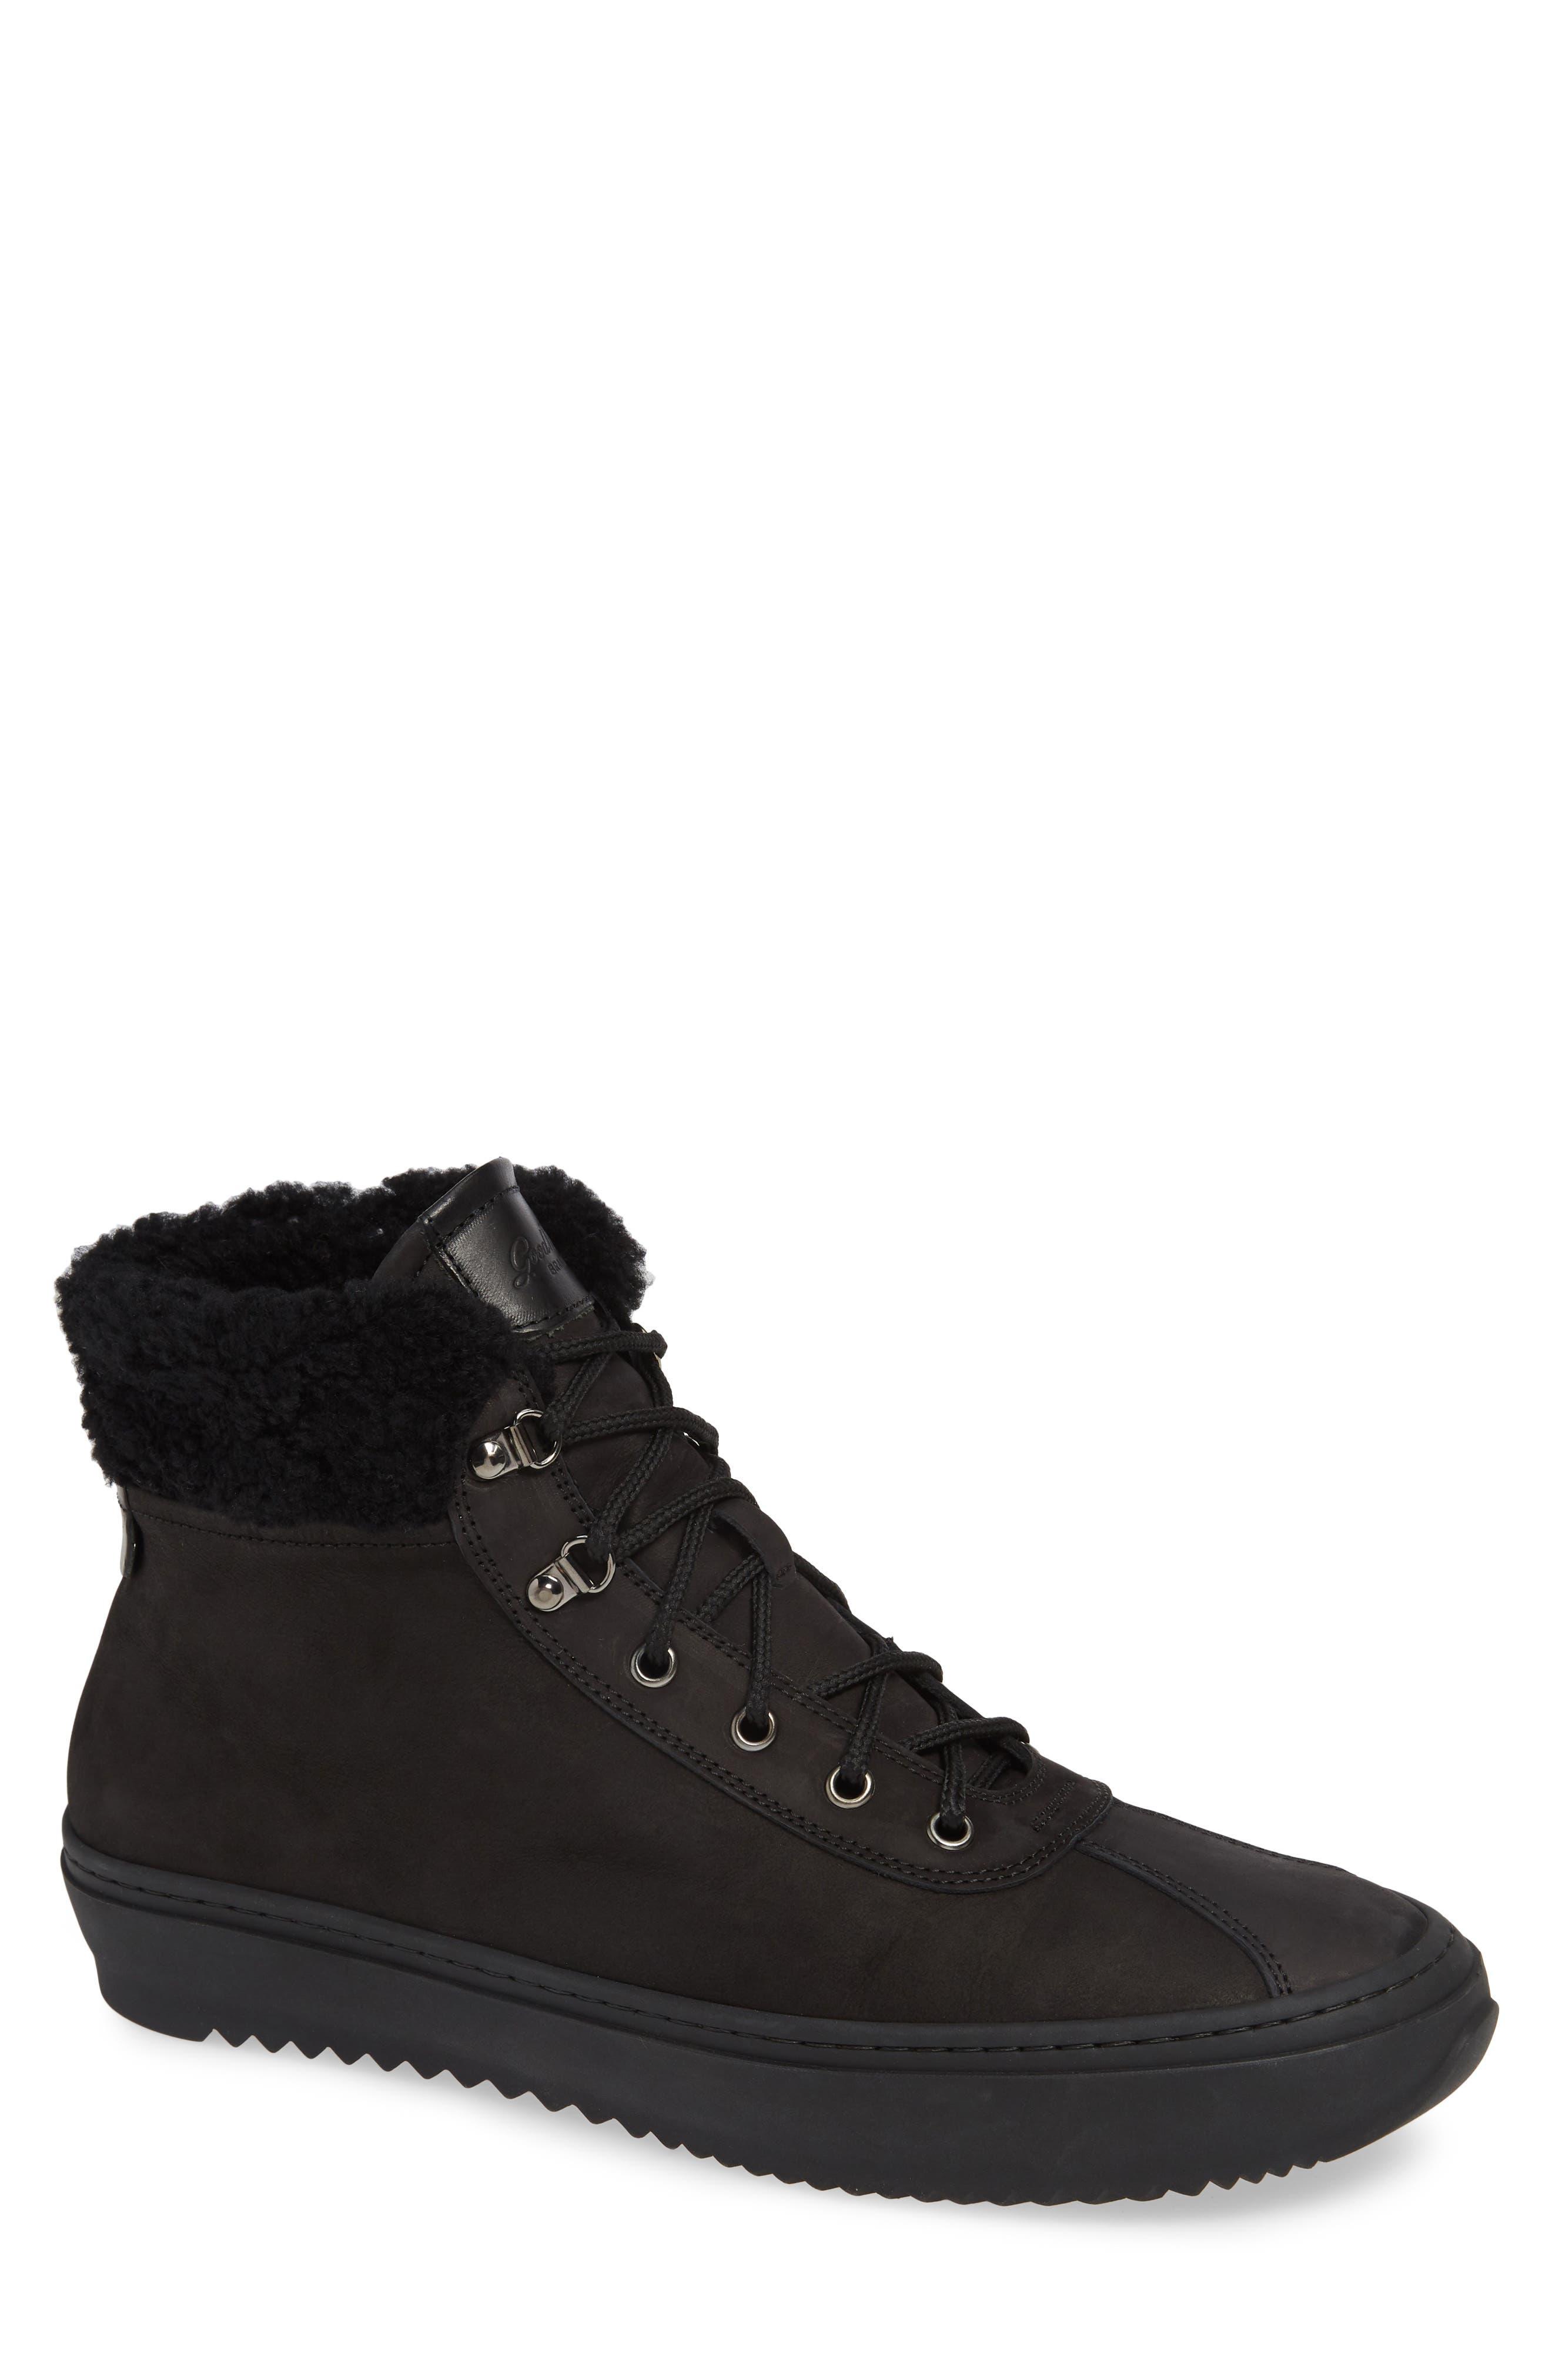 Hiker Street Sneaker,                             Main thumbnail 1, color,                             BLACK LEATHER